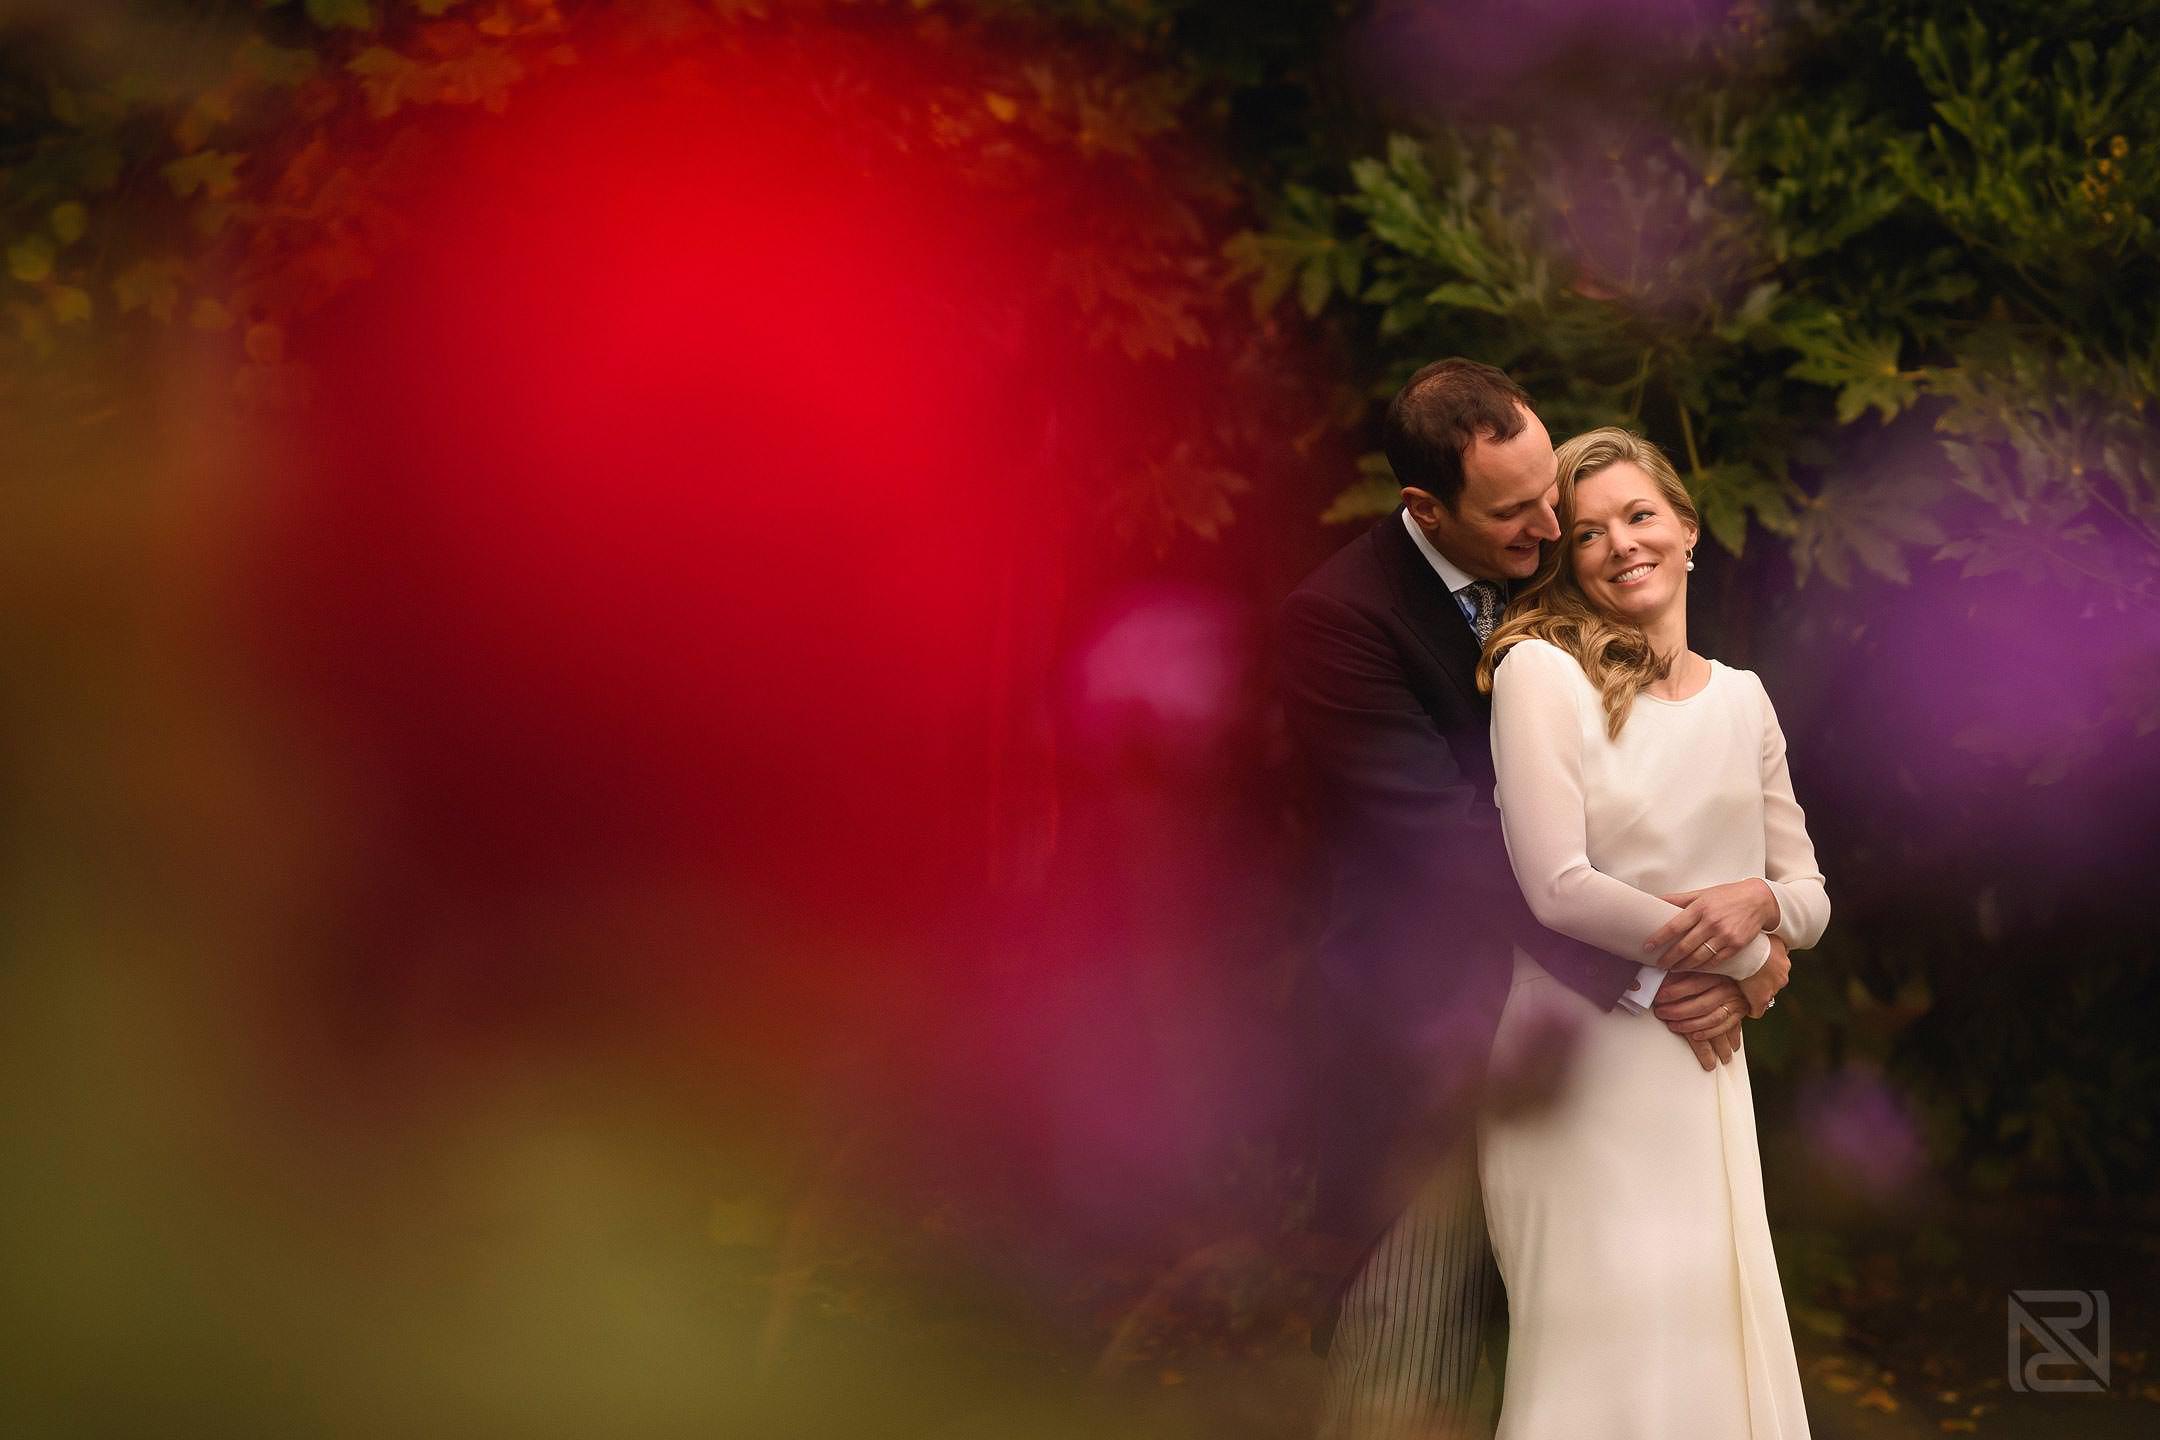 best-wedding-photographs-2015-072